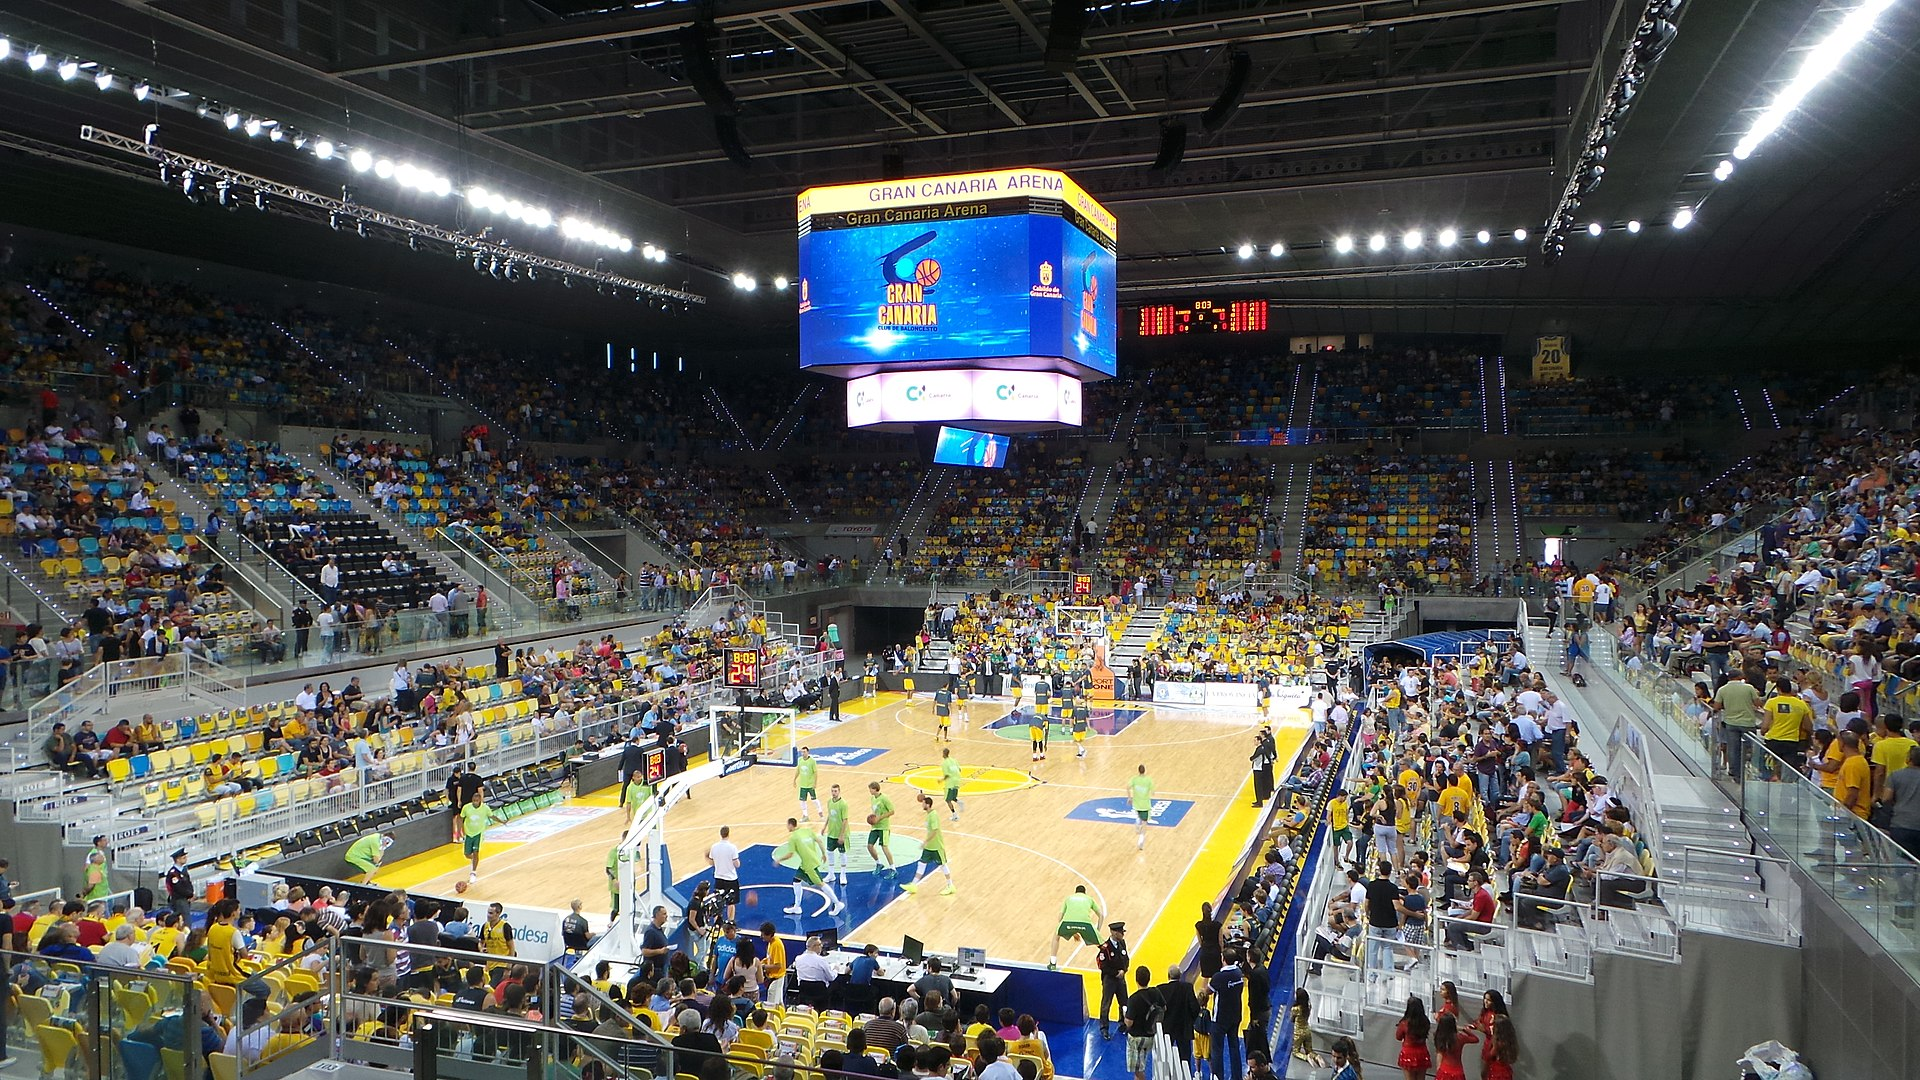 Gran canaria arena wikipedia for Gran canaria padel indoor